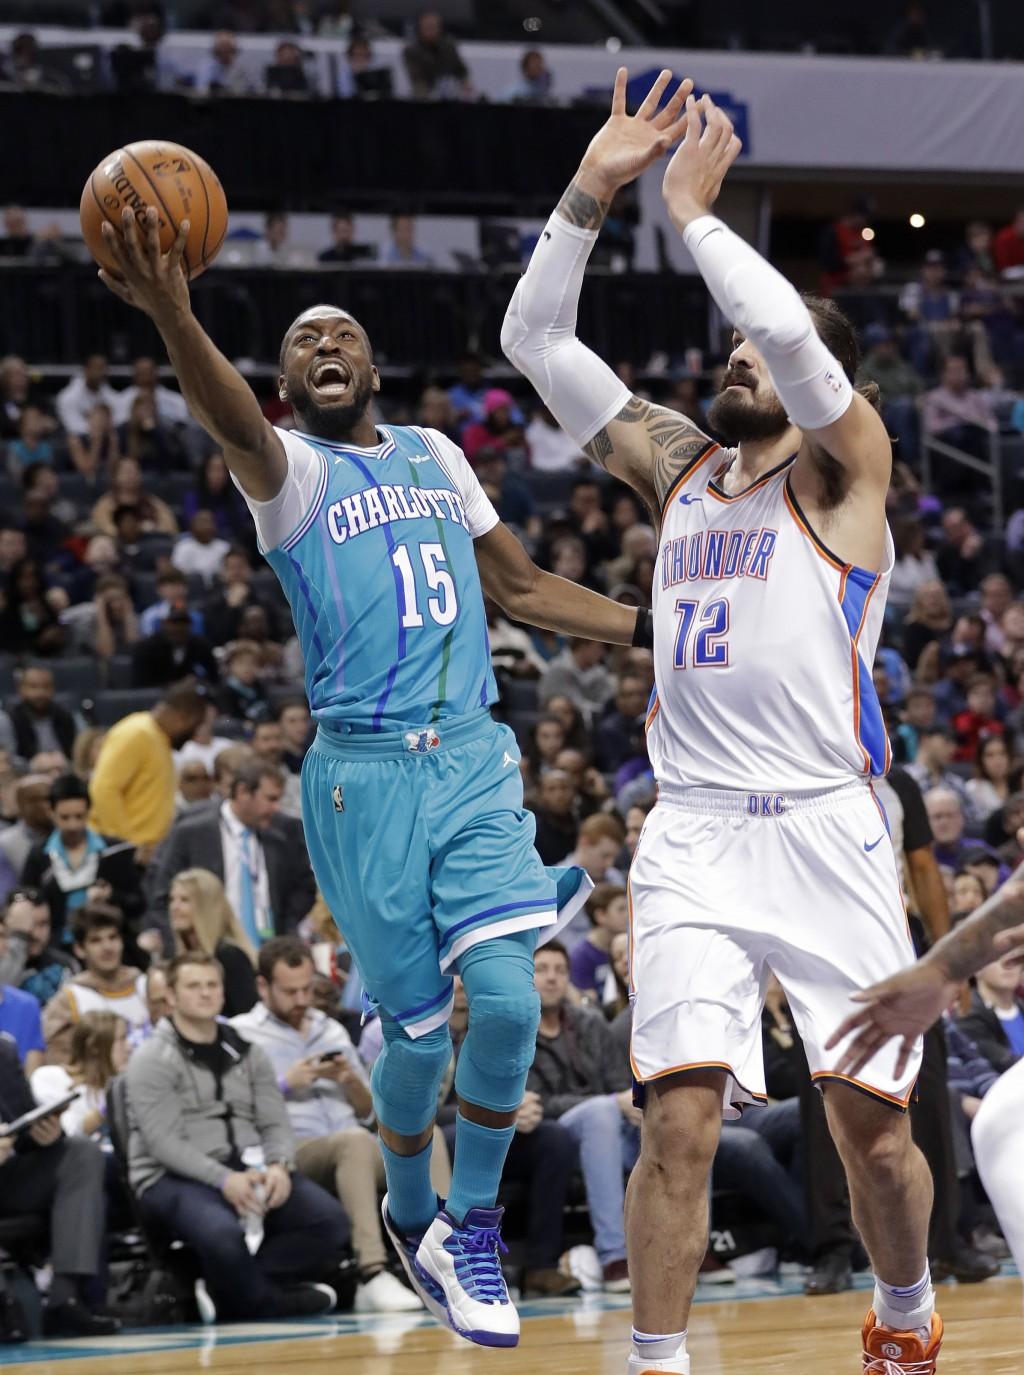 Charlotte Hornets' Kemba Walker (15) drives past Oklahoma City Thunder's Steven Adams (12) during the first half of an NBA basketball game in Charlott